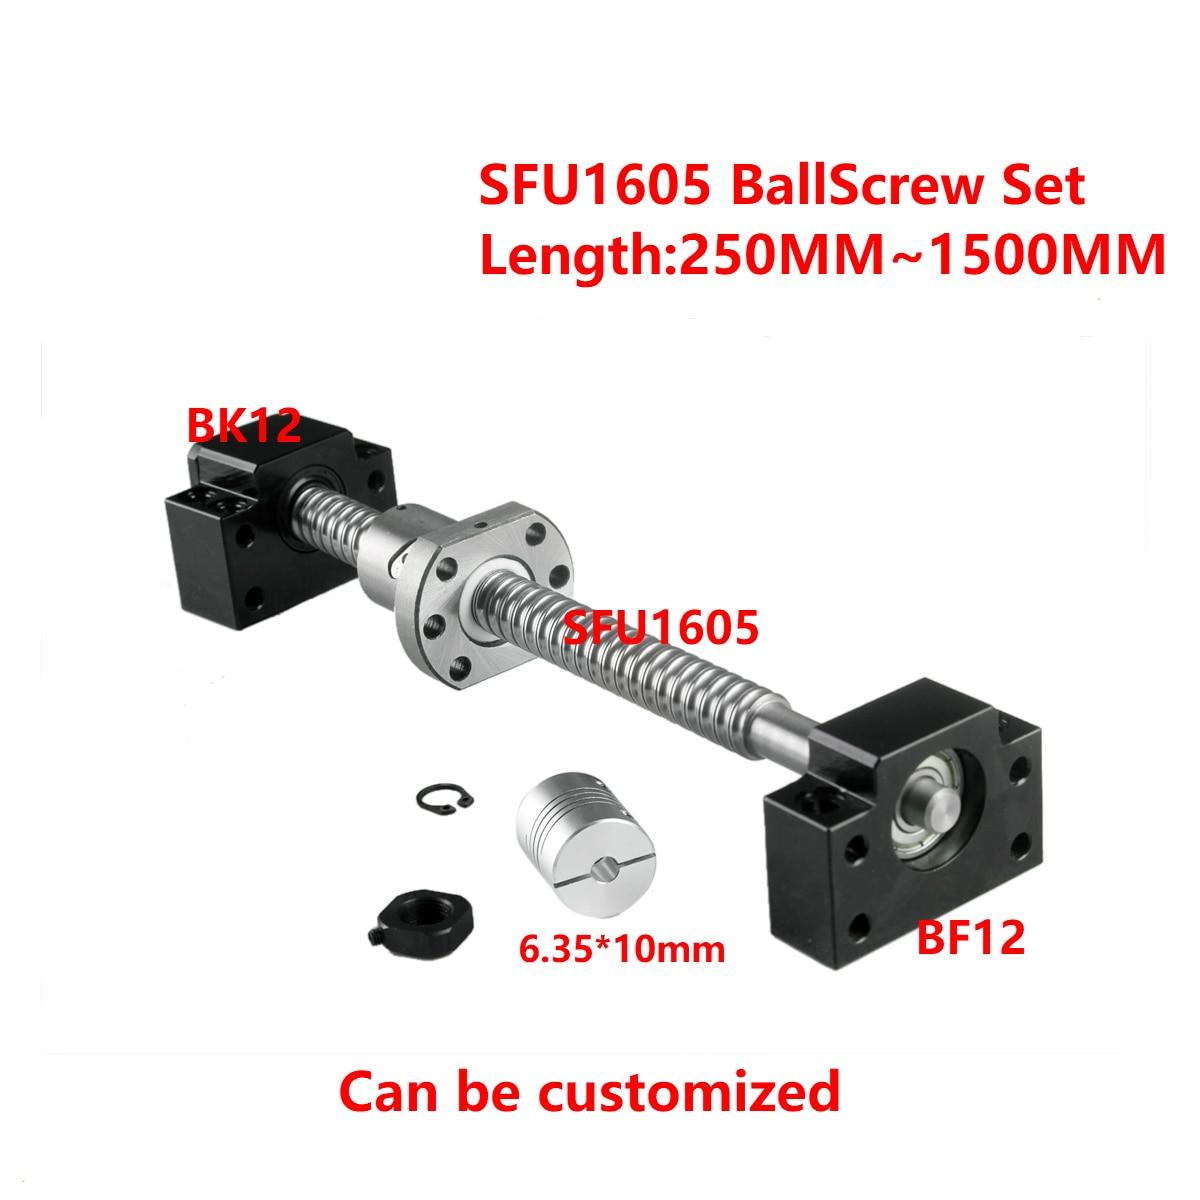 Ball Screw SFU1605-250 300 350 400 450 500 600 650 700 900 1000mm End Machined & BK12 BF12 + 6.35x10mm Coupler Set